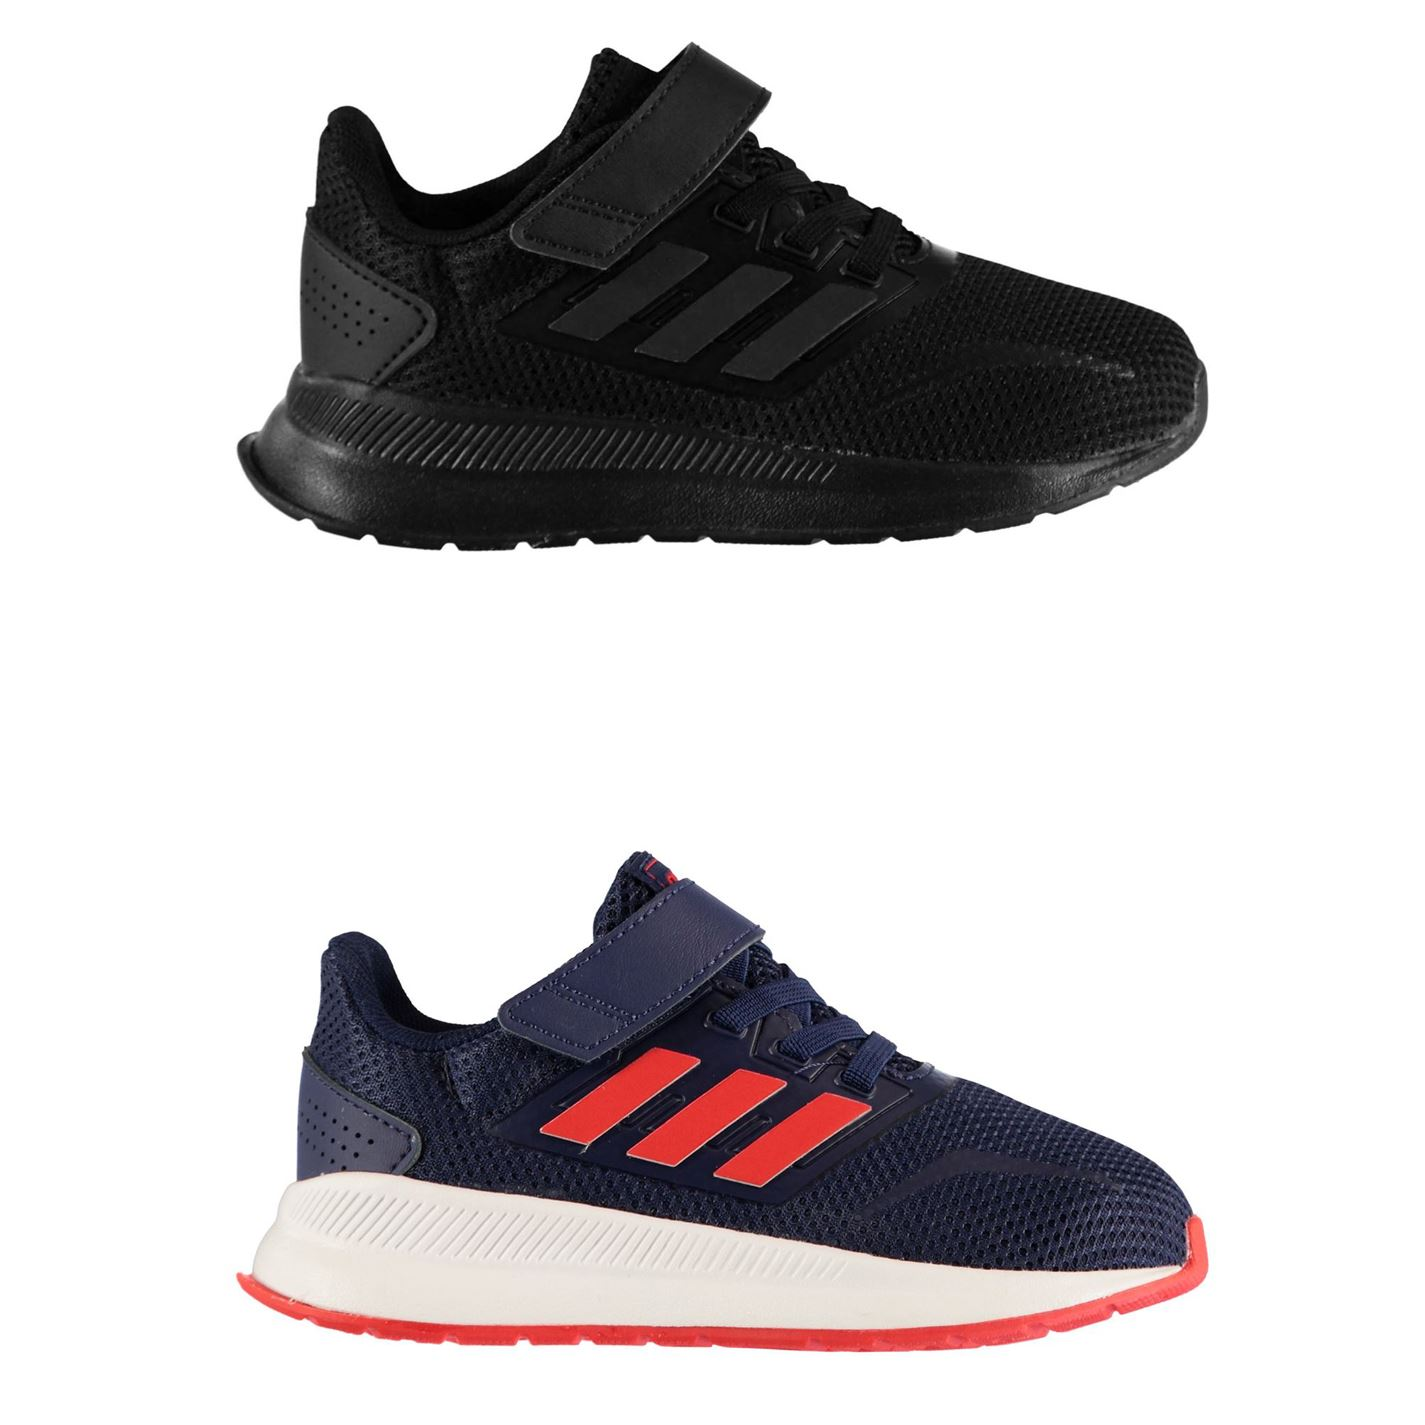 ADIDAS RUNFALCON G28729 Sneaker Herren Herrenschuhe